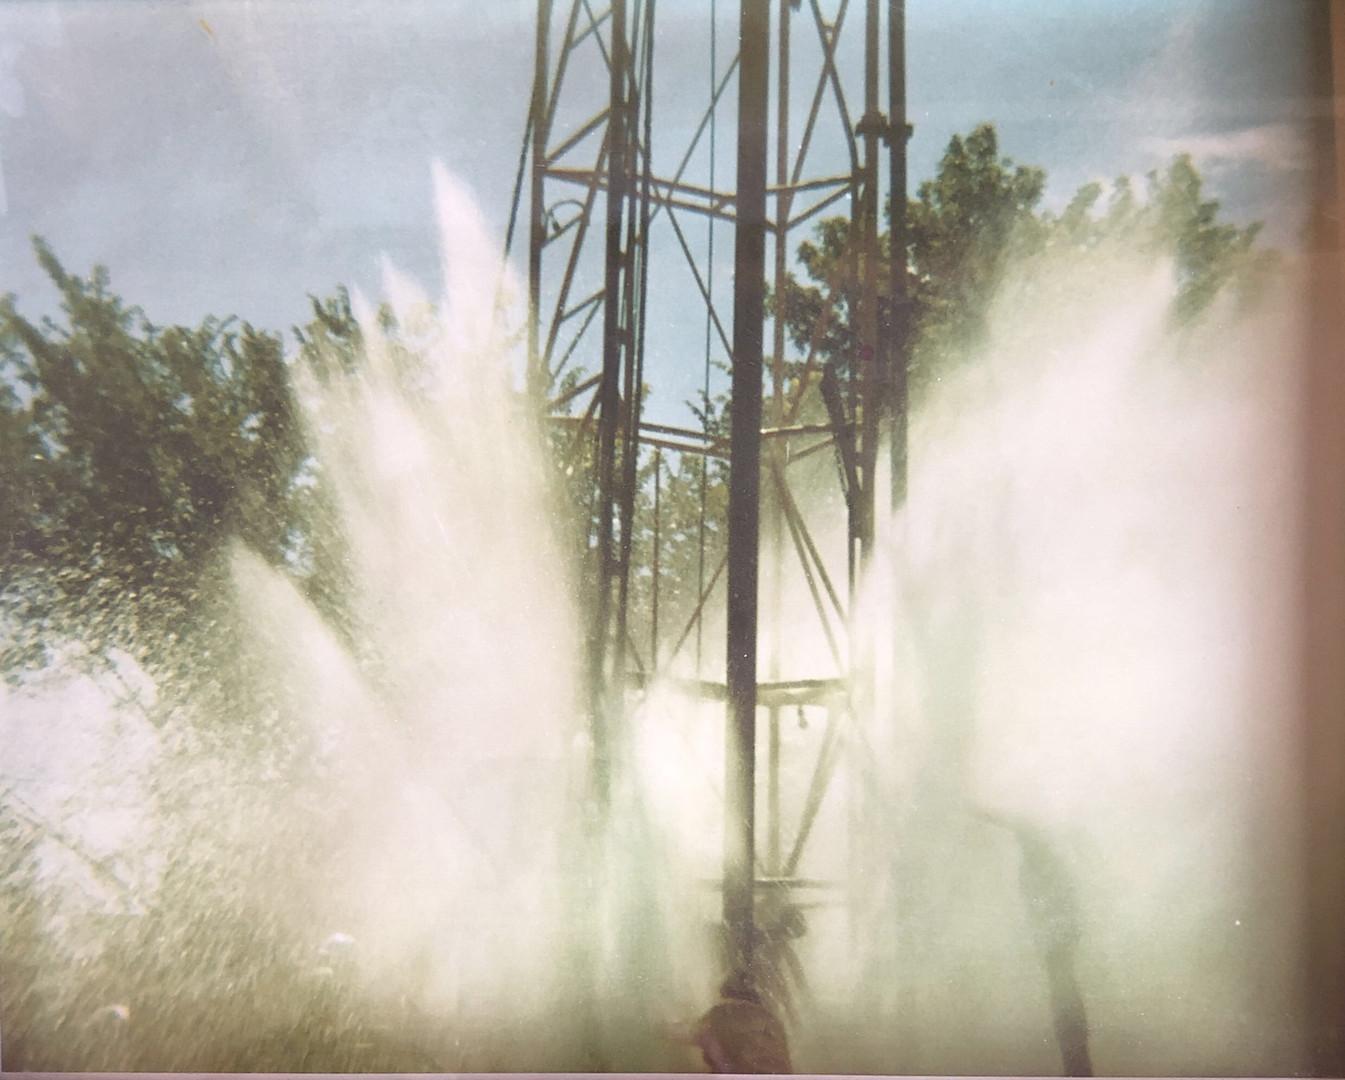 Artesian Well, 1970